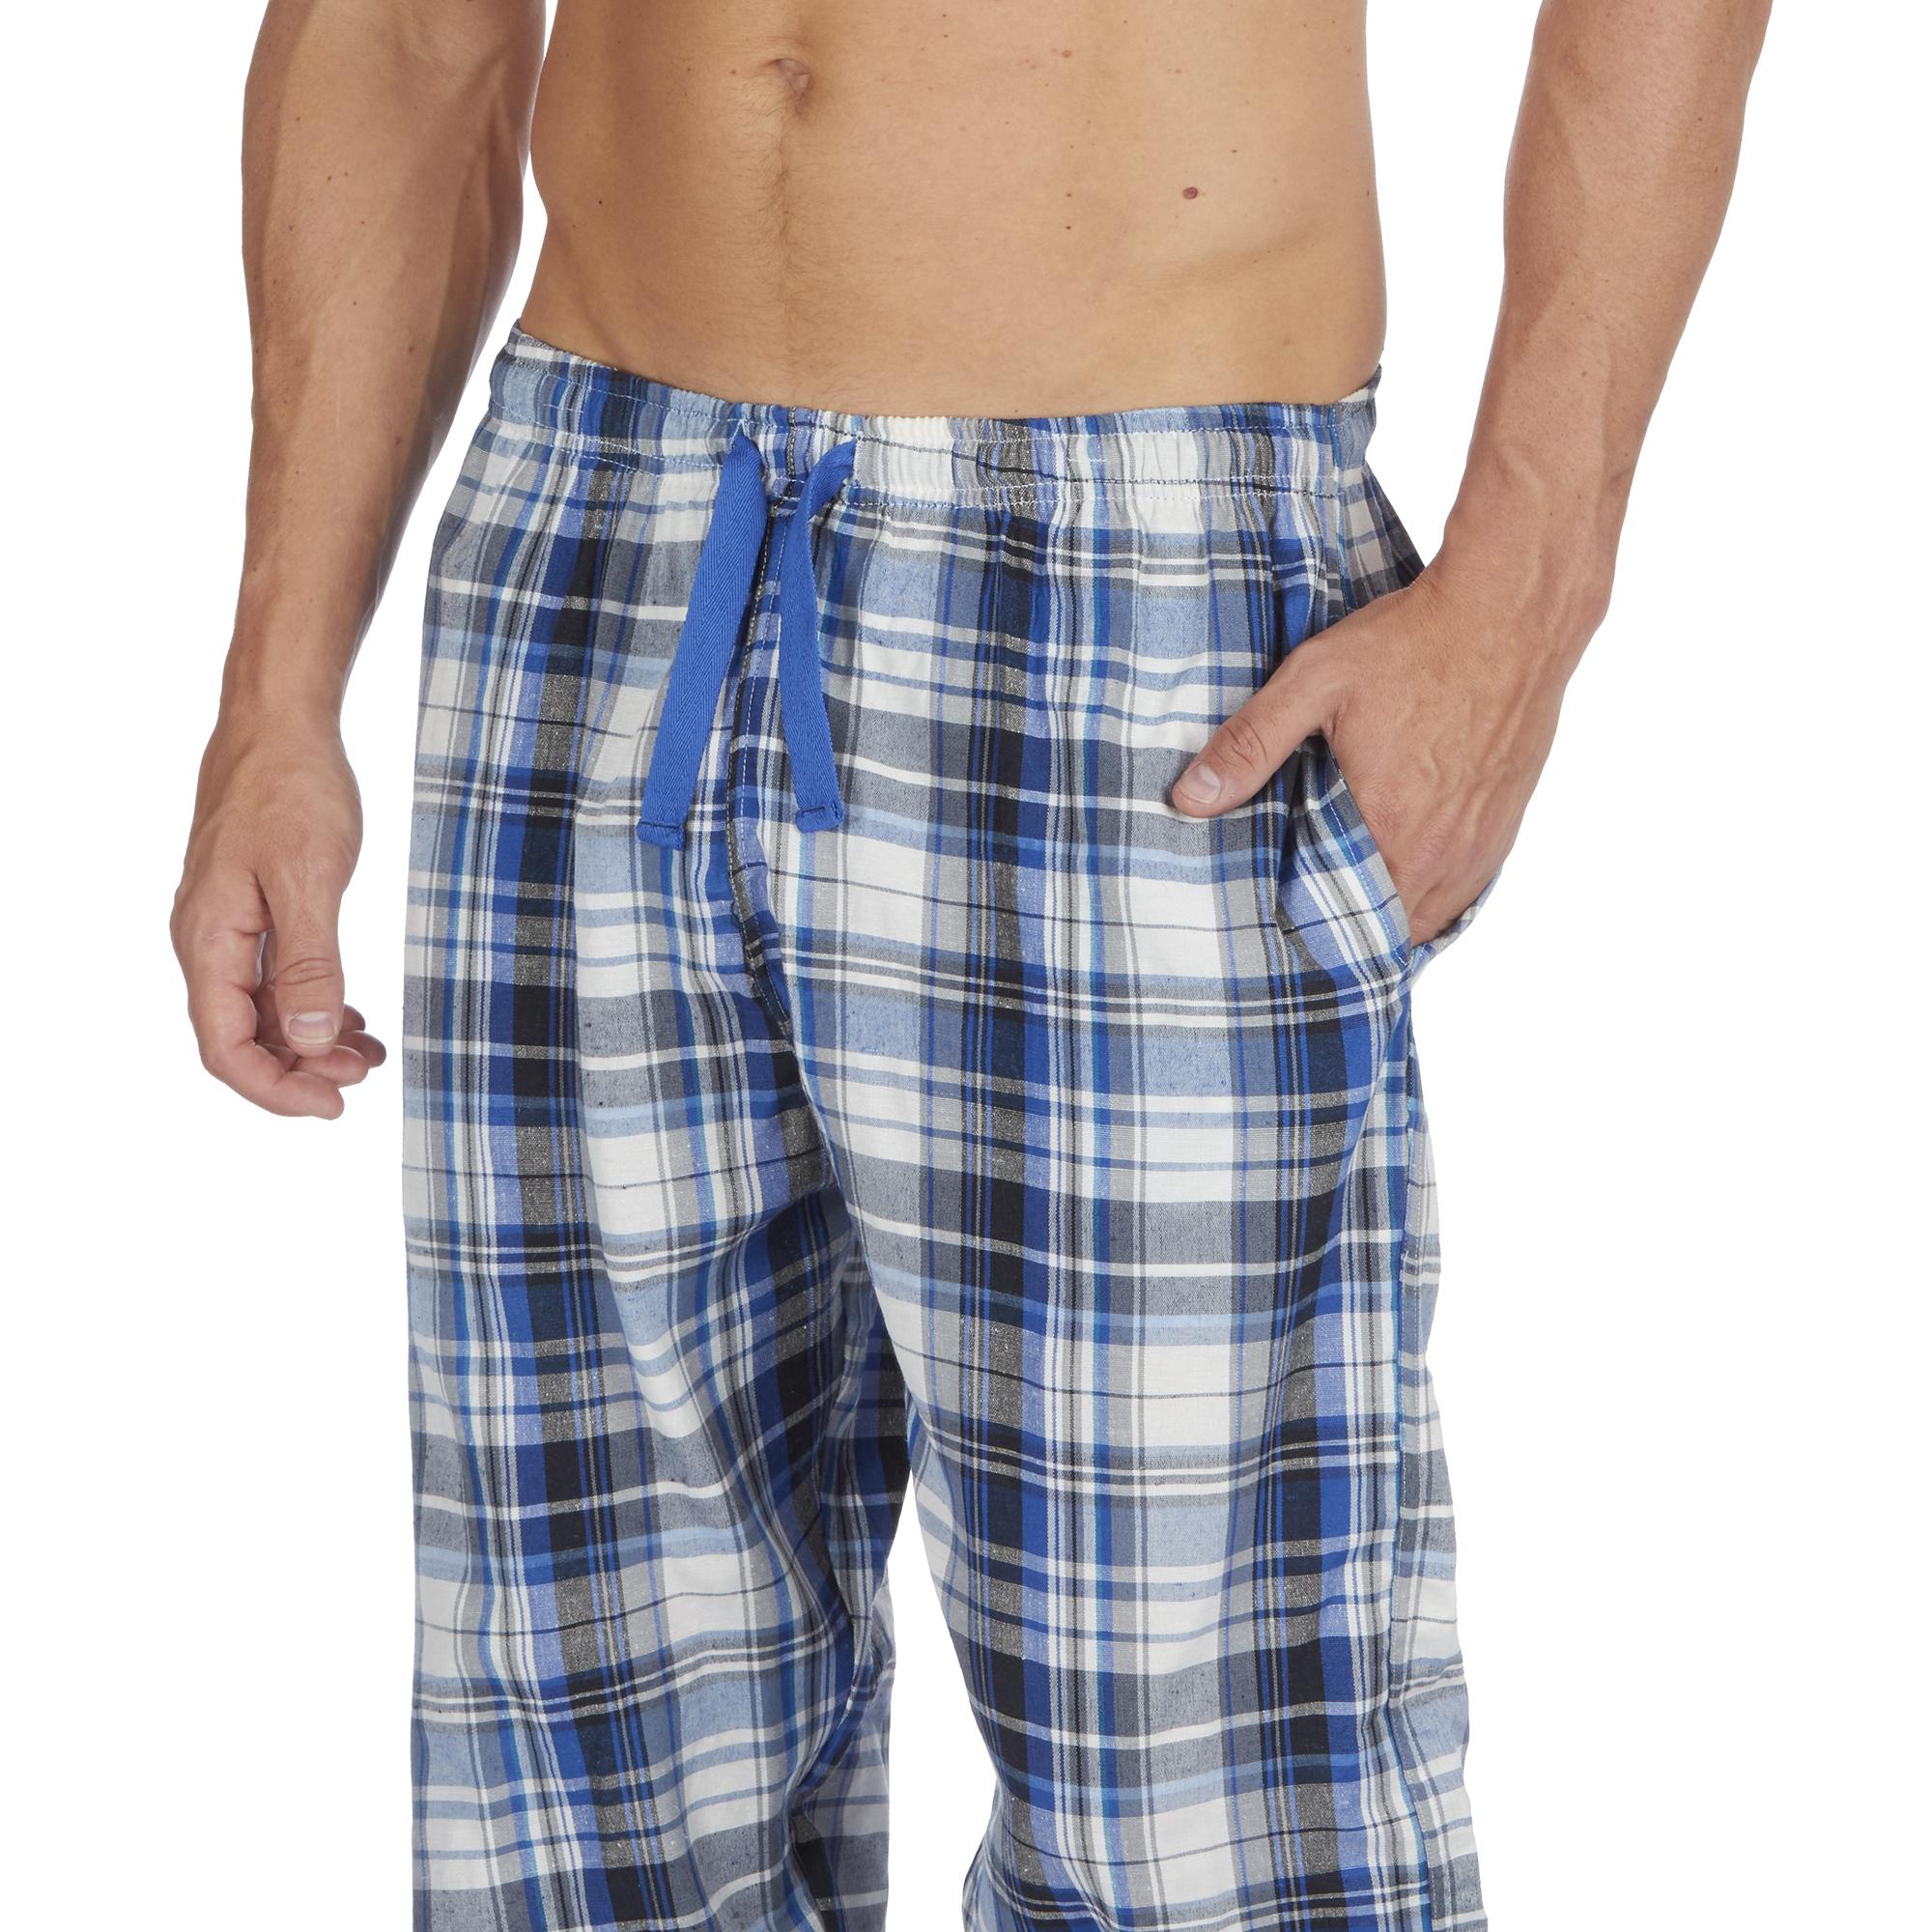 Jason-Jones-Homme-Carreaux-Tisse-Pyjama-Pantalon-en-Coton-Melange-Serge-PJ-Lounge-Pants miniature 18